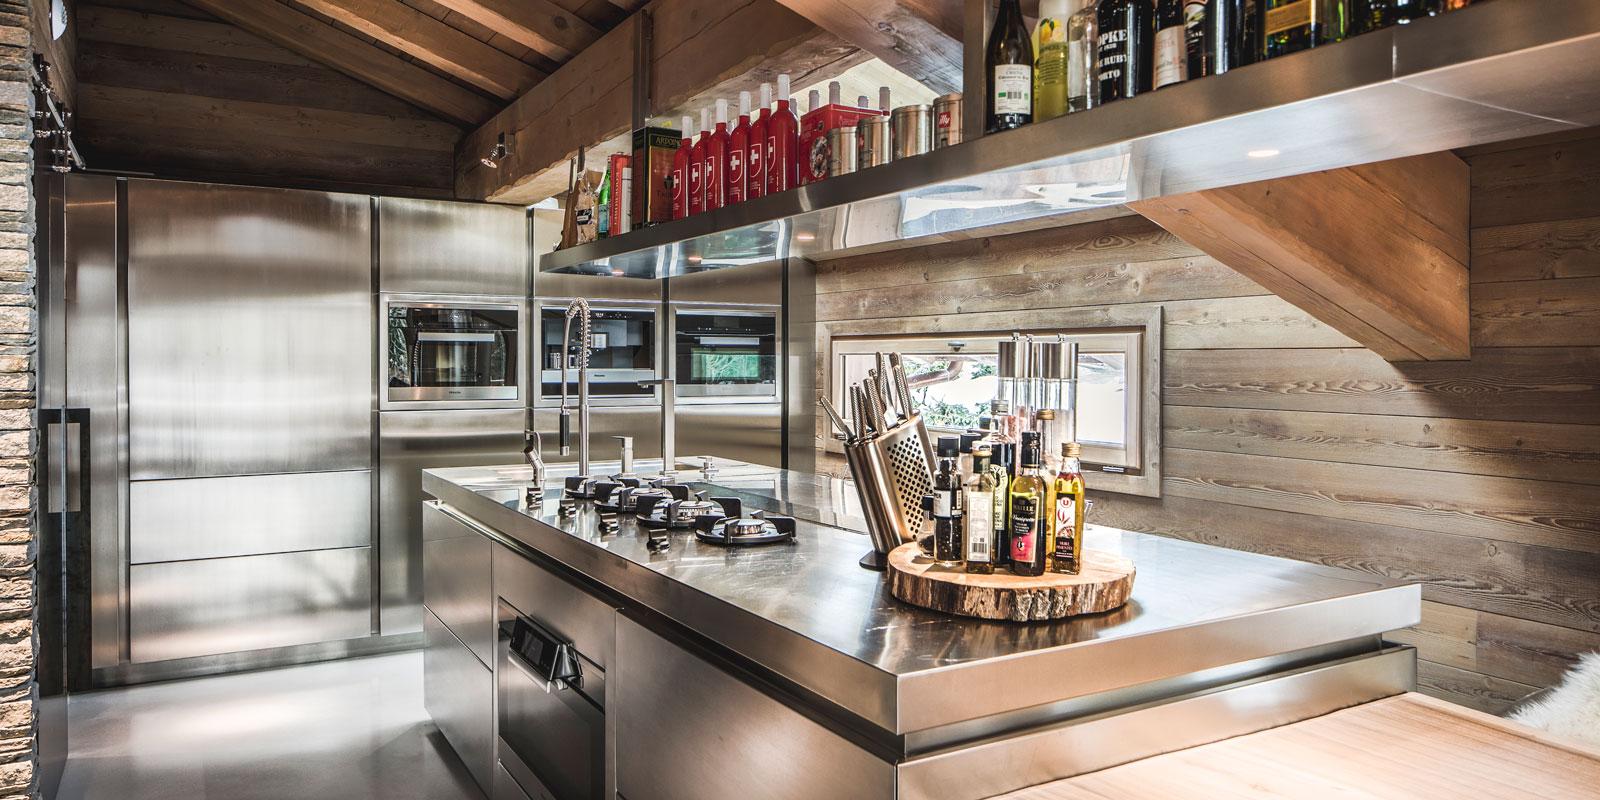 Keuken op maat, Culimaat, High-end kitchens, maatwerk, hoogwaardige materialen, robuust